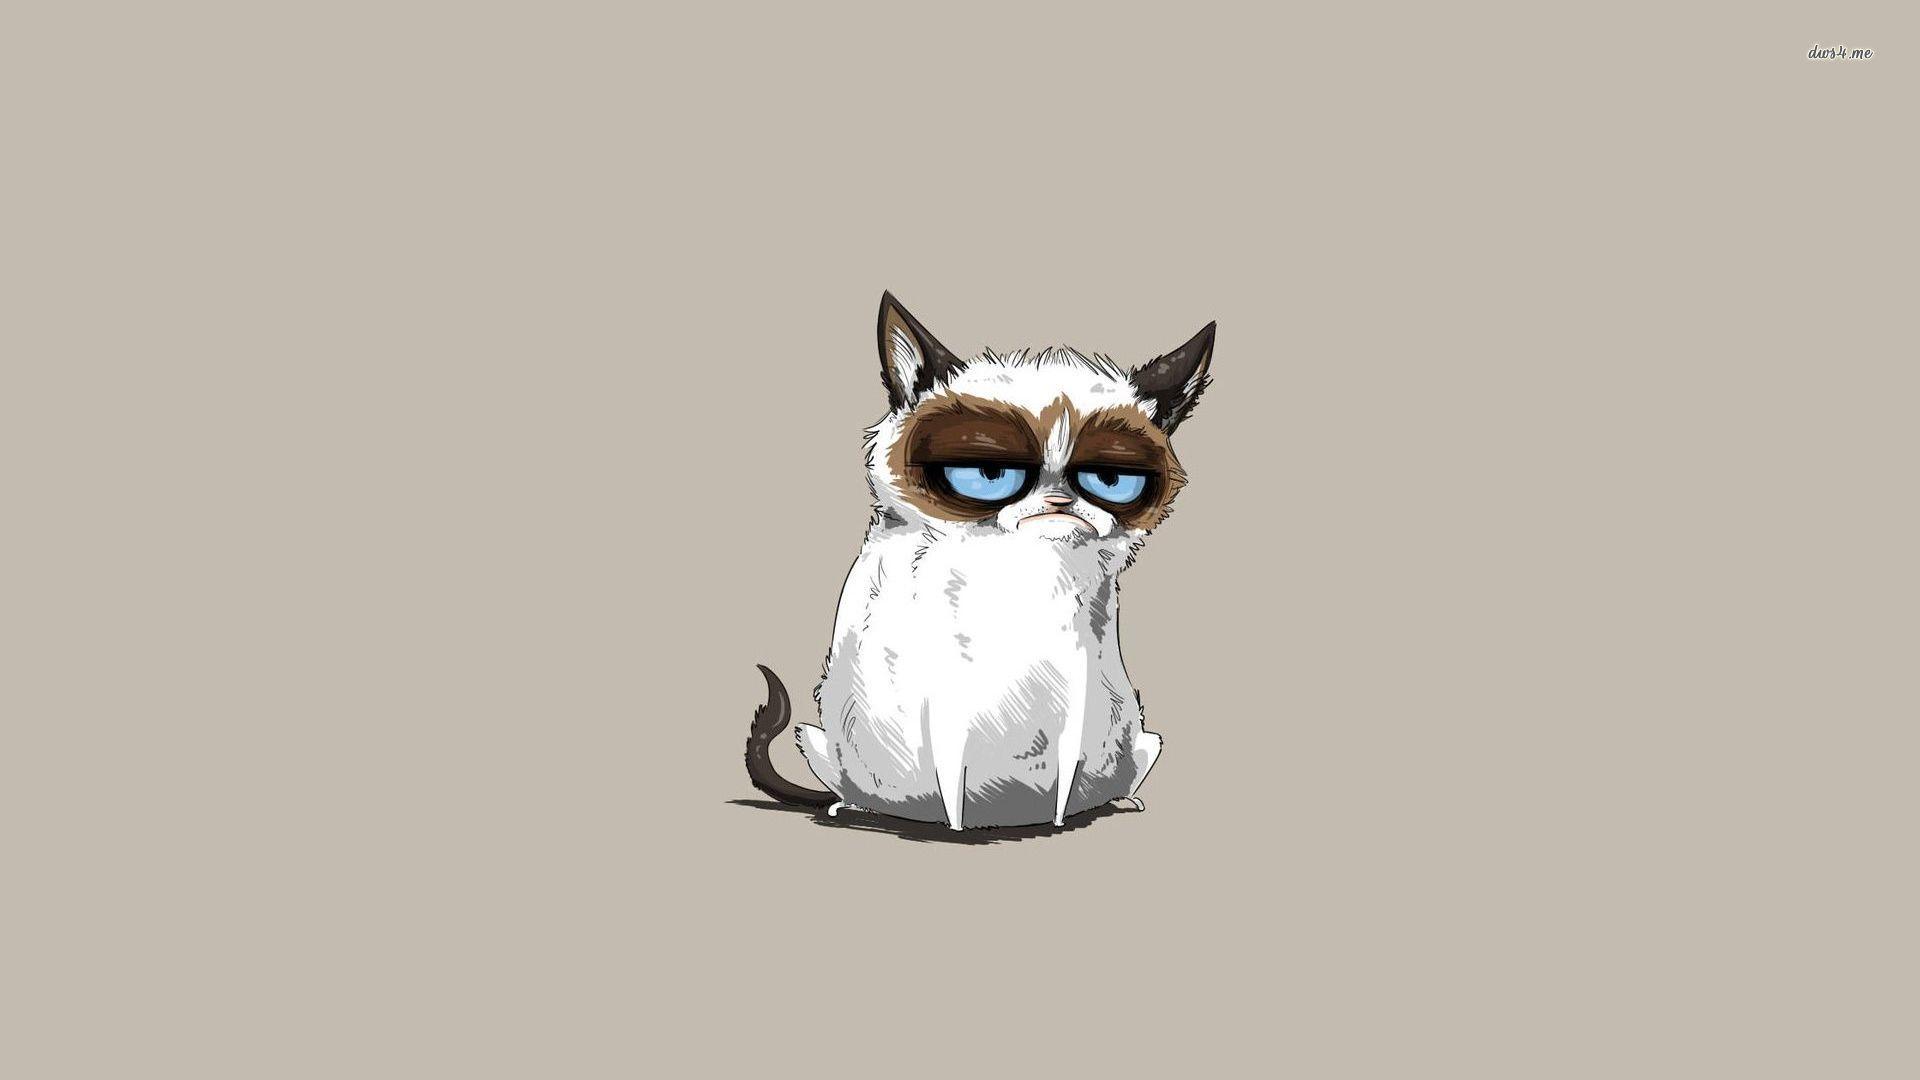 Grumpy Cat Wallpaper Background with HD Desktop 1920x1080 px 56.30 KB | Phone Wallpaper in 2019 ...